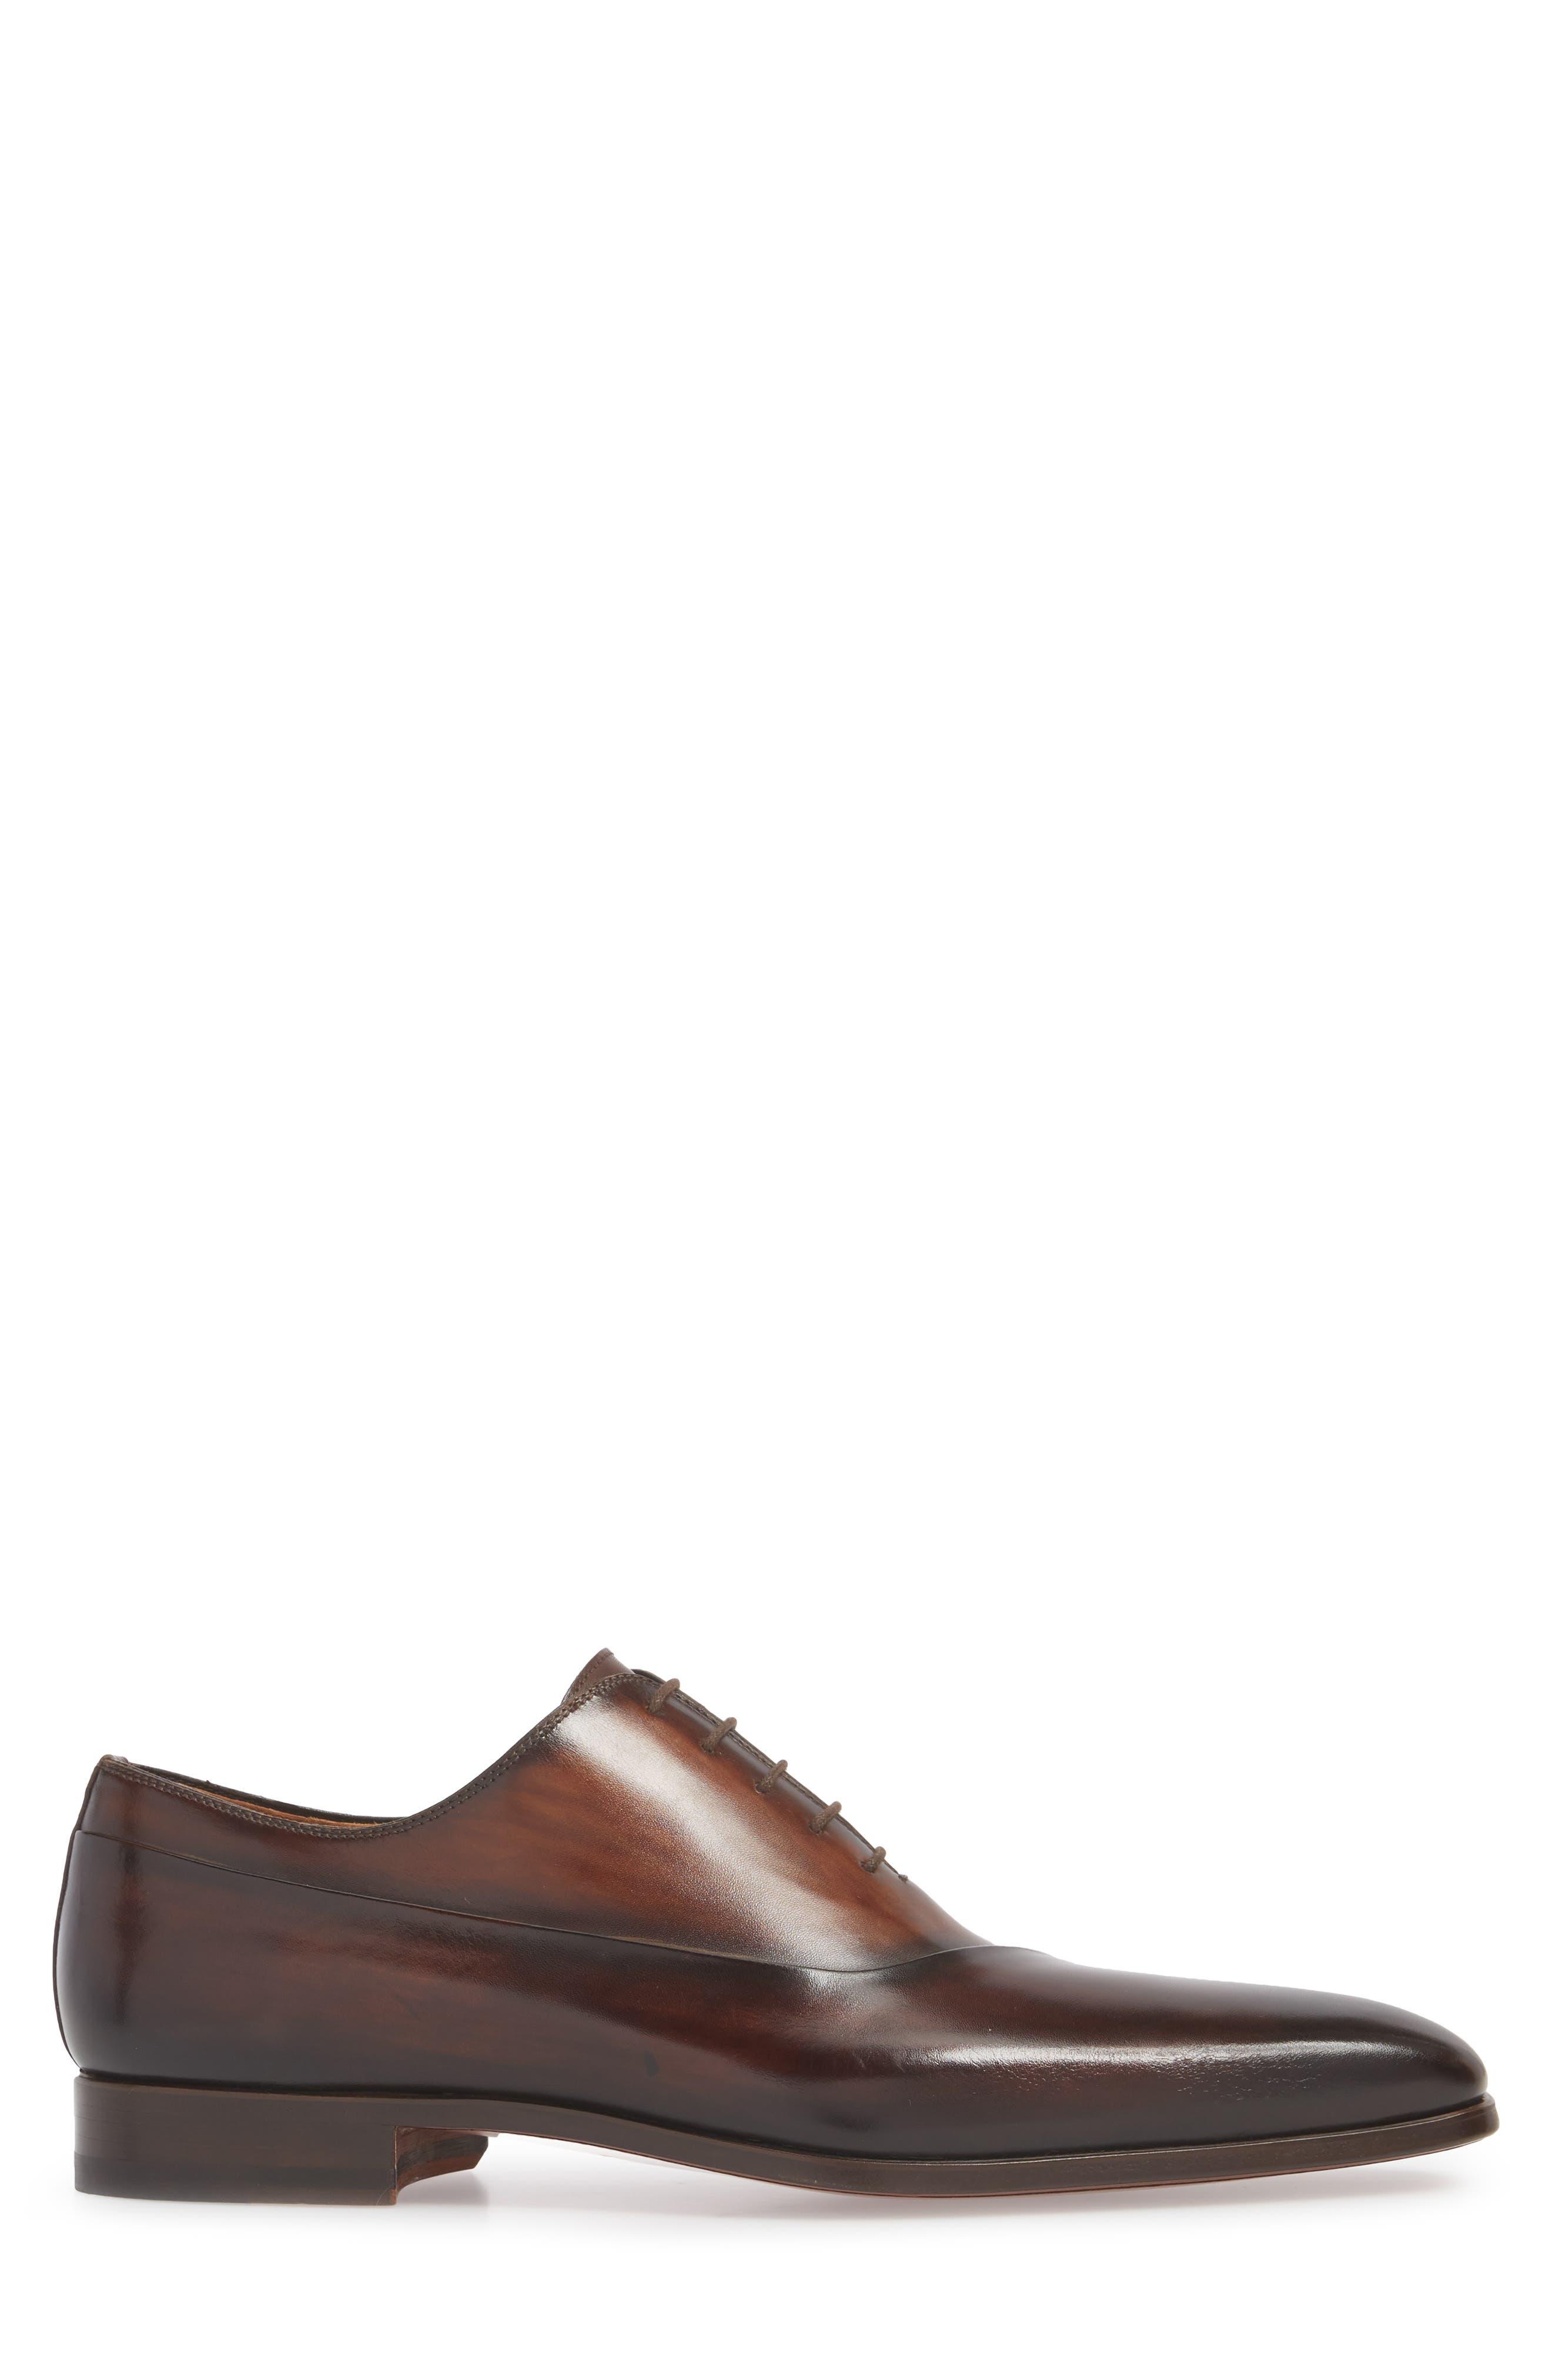 Cristiano Asymmetrical Whole Cut Shoe,                             Alternate thumbnail 3, color,                             200